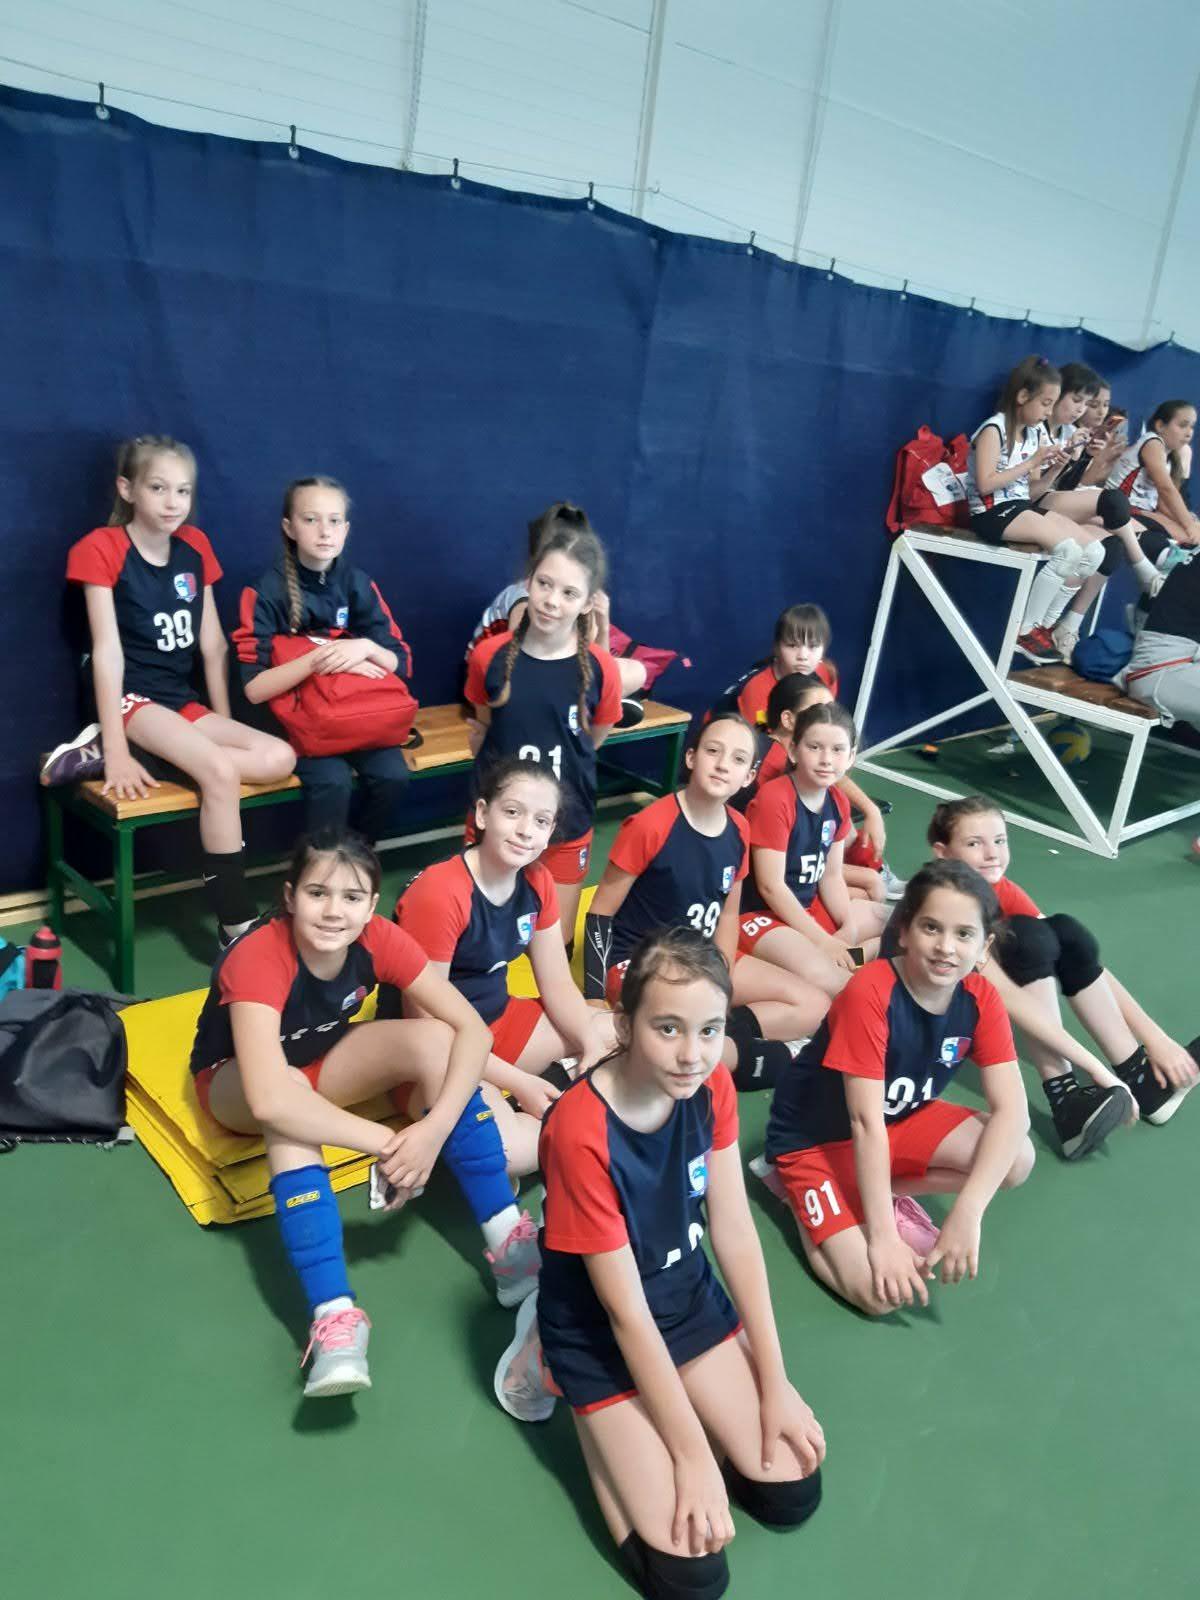 Druženje | Mini Volley liga | III - IV kolo | sezona | 2020/2021 - 2